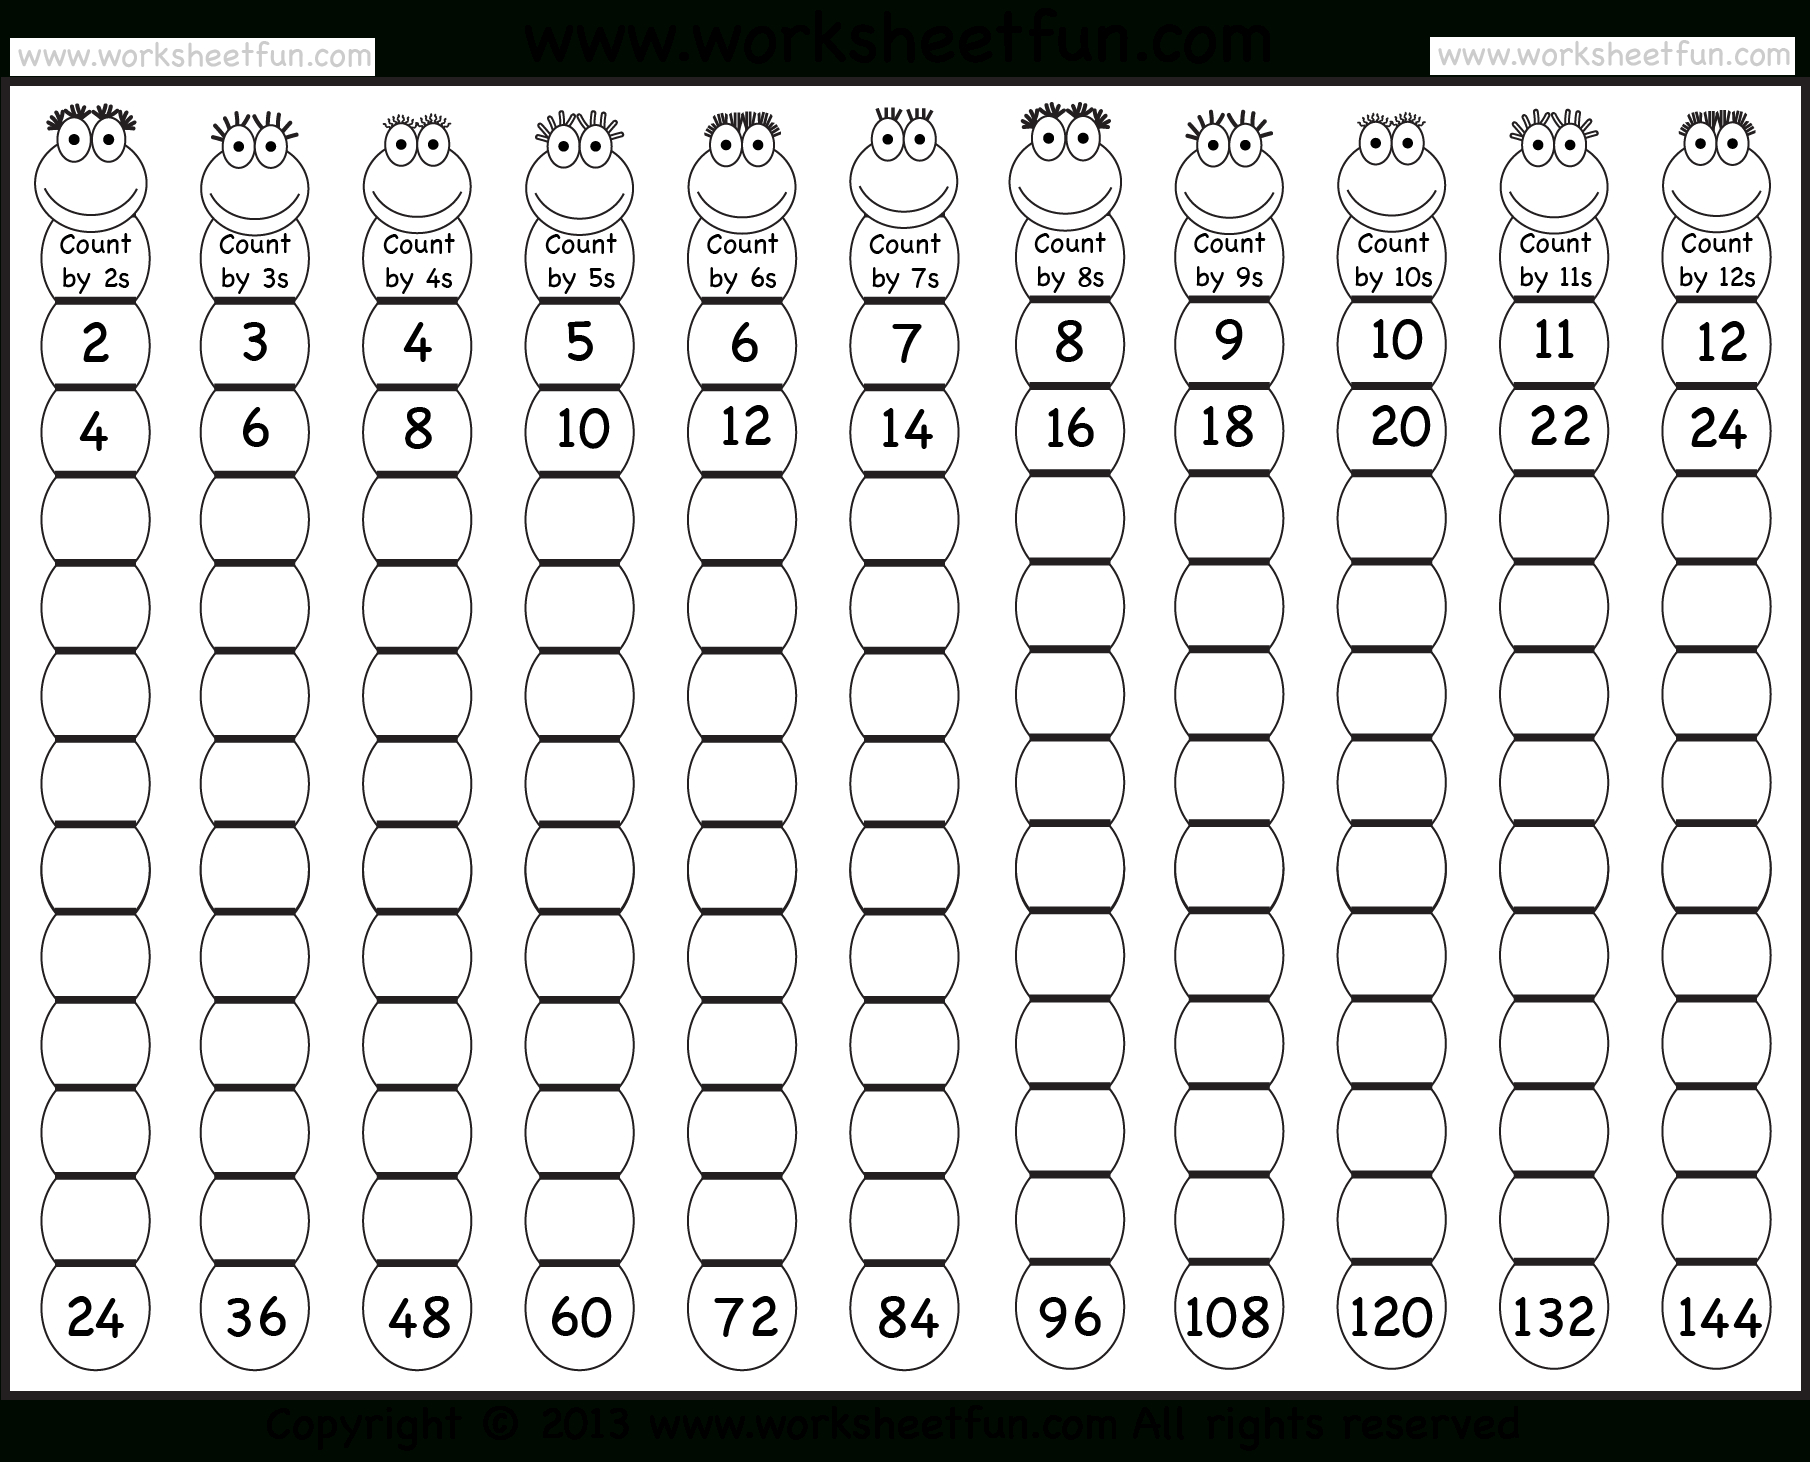 Times Table – 2-12 Worksheets – 1, 2, 3, 4, 5, 6, 7, 8, 9, 10, 11 | Multiplication Worksheets 1 12 Printable